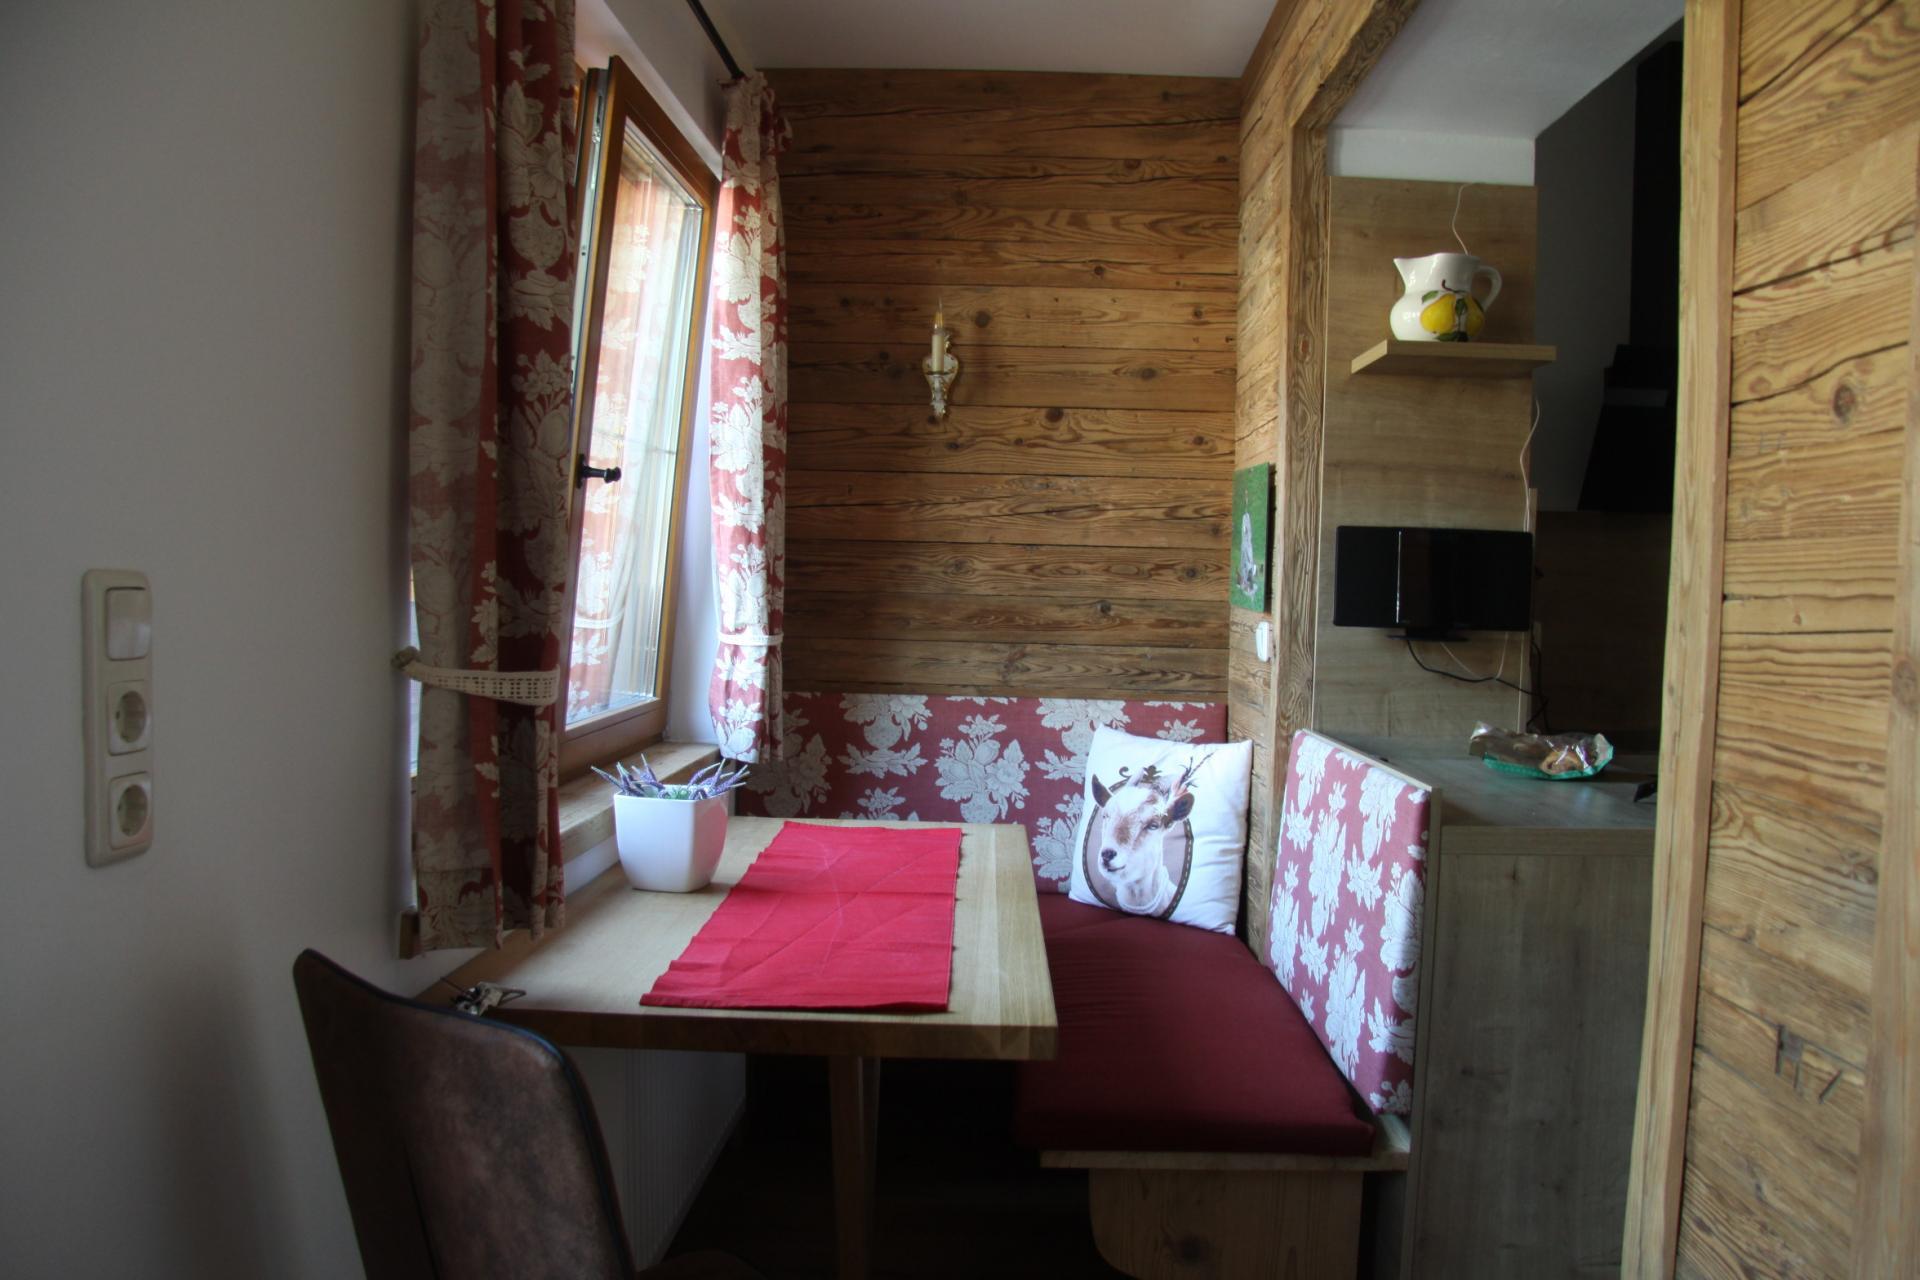 HAUS ERIKA apartments #Willkommen#Bildergalerie